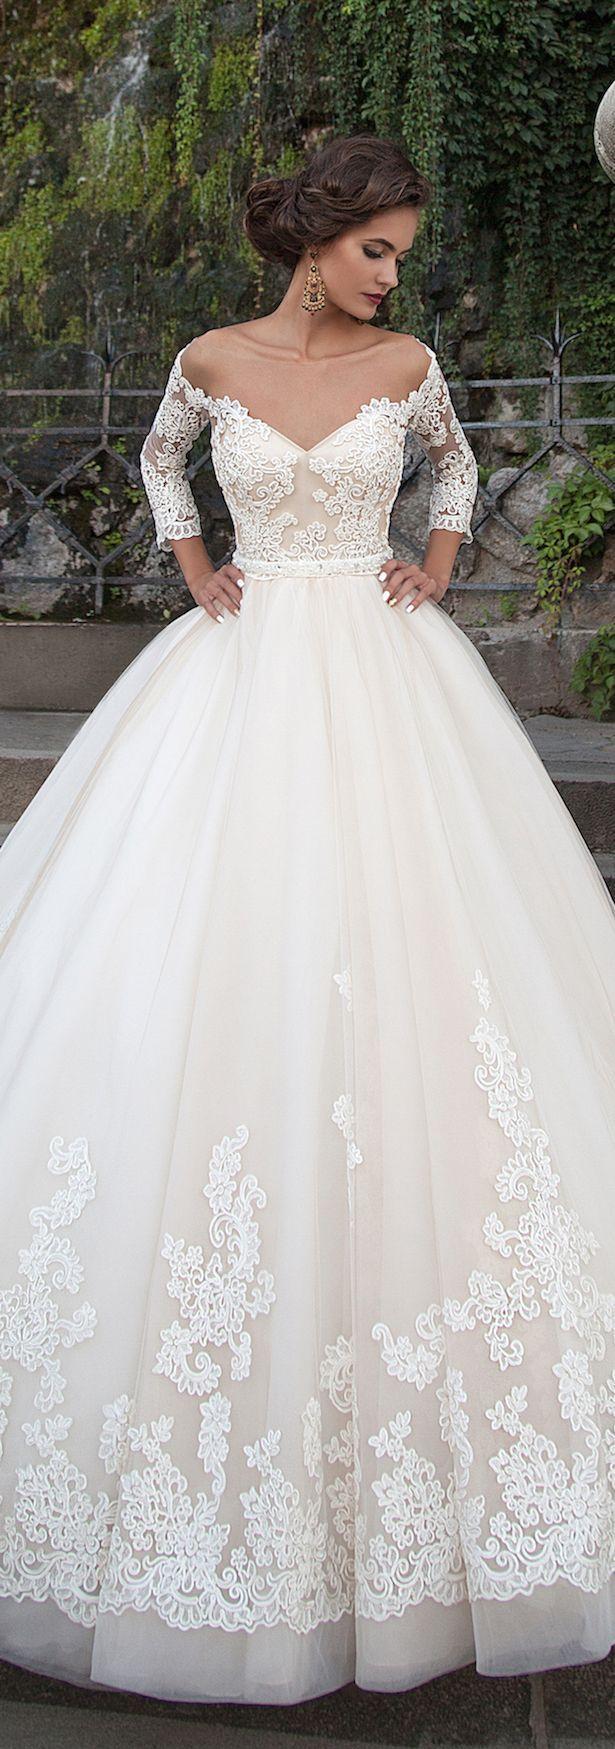 Milla nova 2016 bridal collection wedding dress bridal milla nova 2016 bridal collection mila nova wedding dresslace ombrellifo Image collections